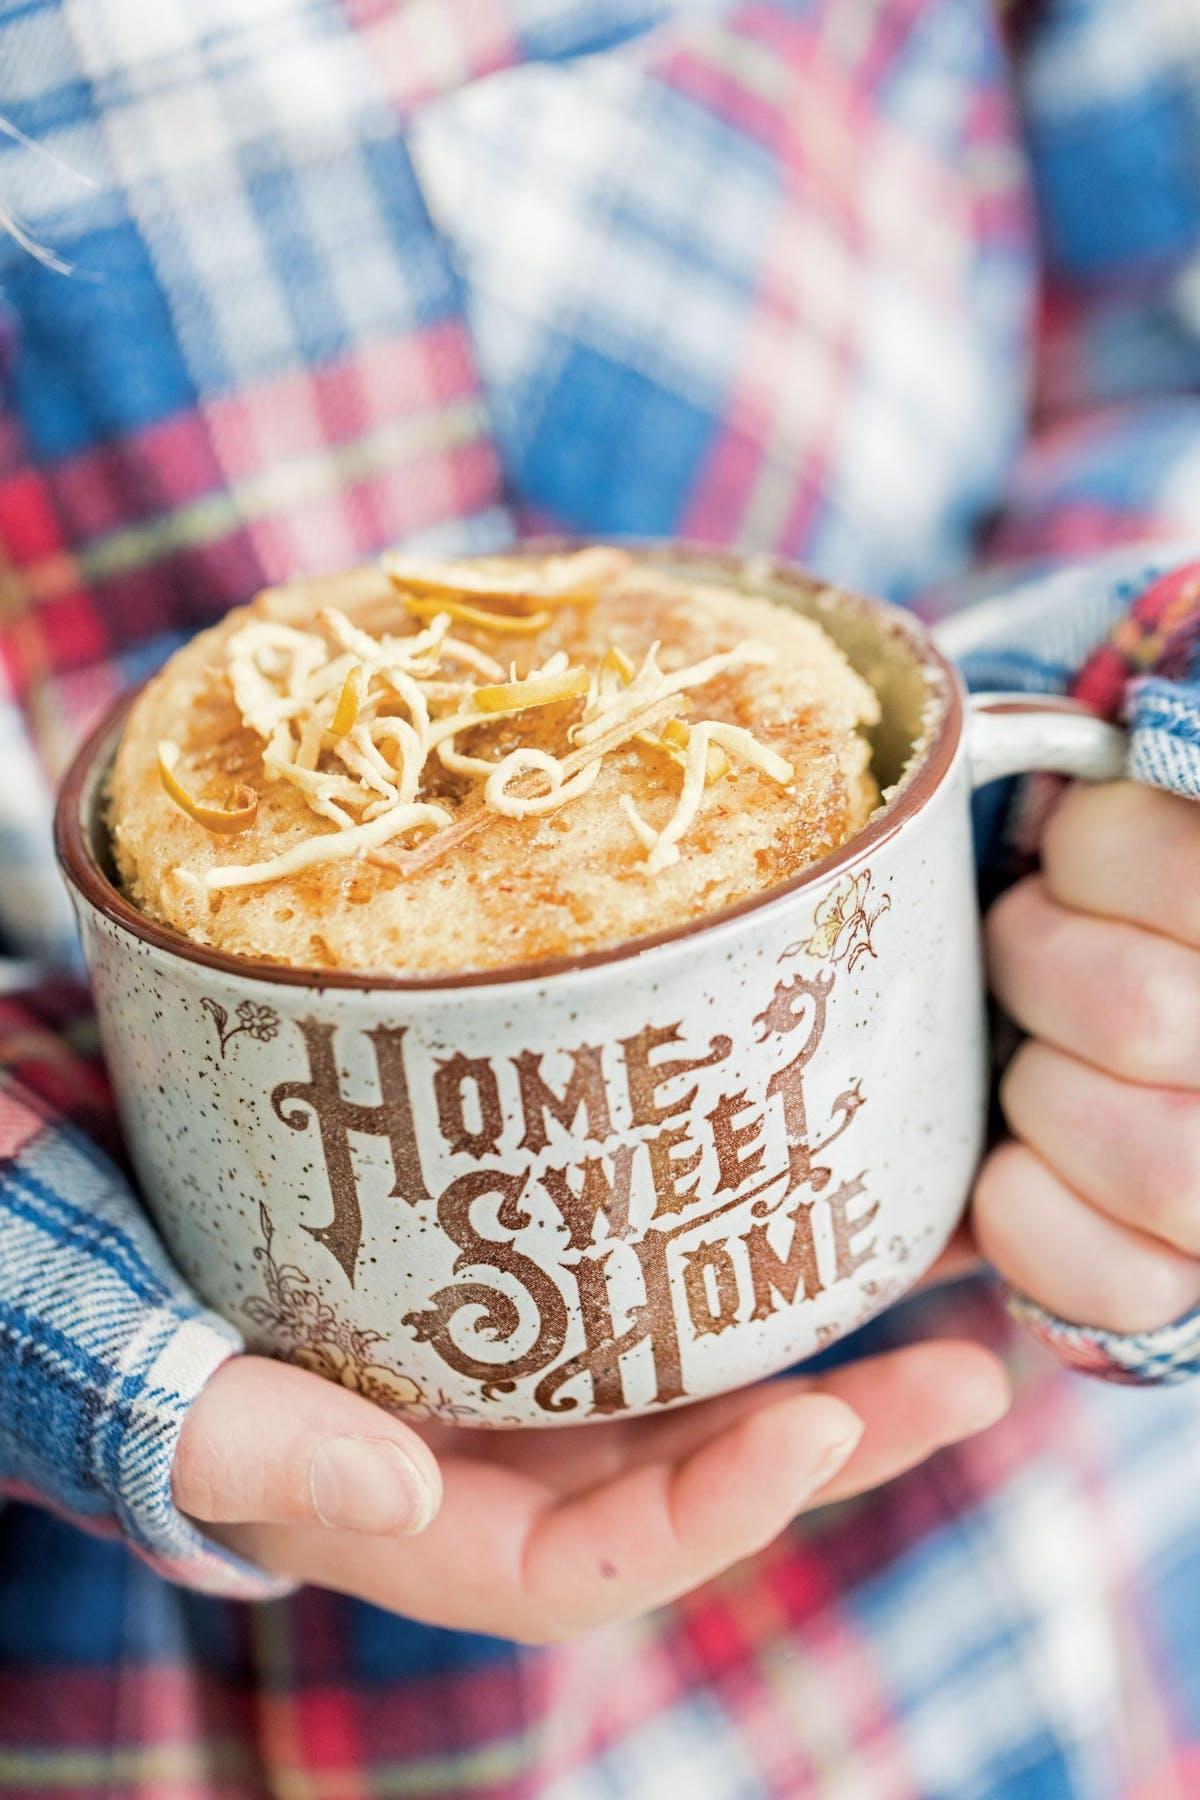 Mug cakes: how to make microwave mug cakes at home